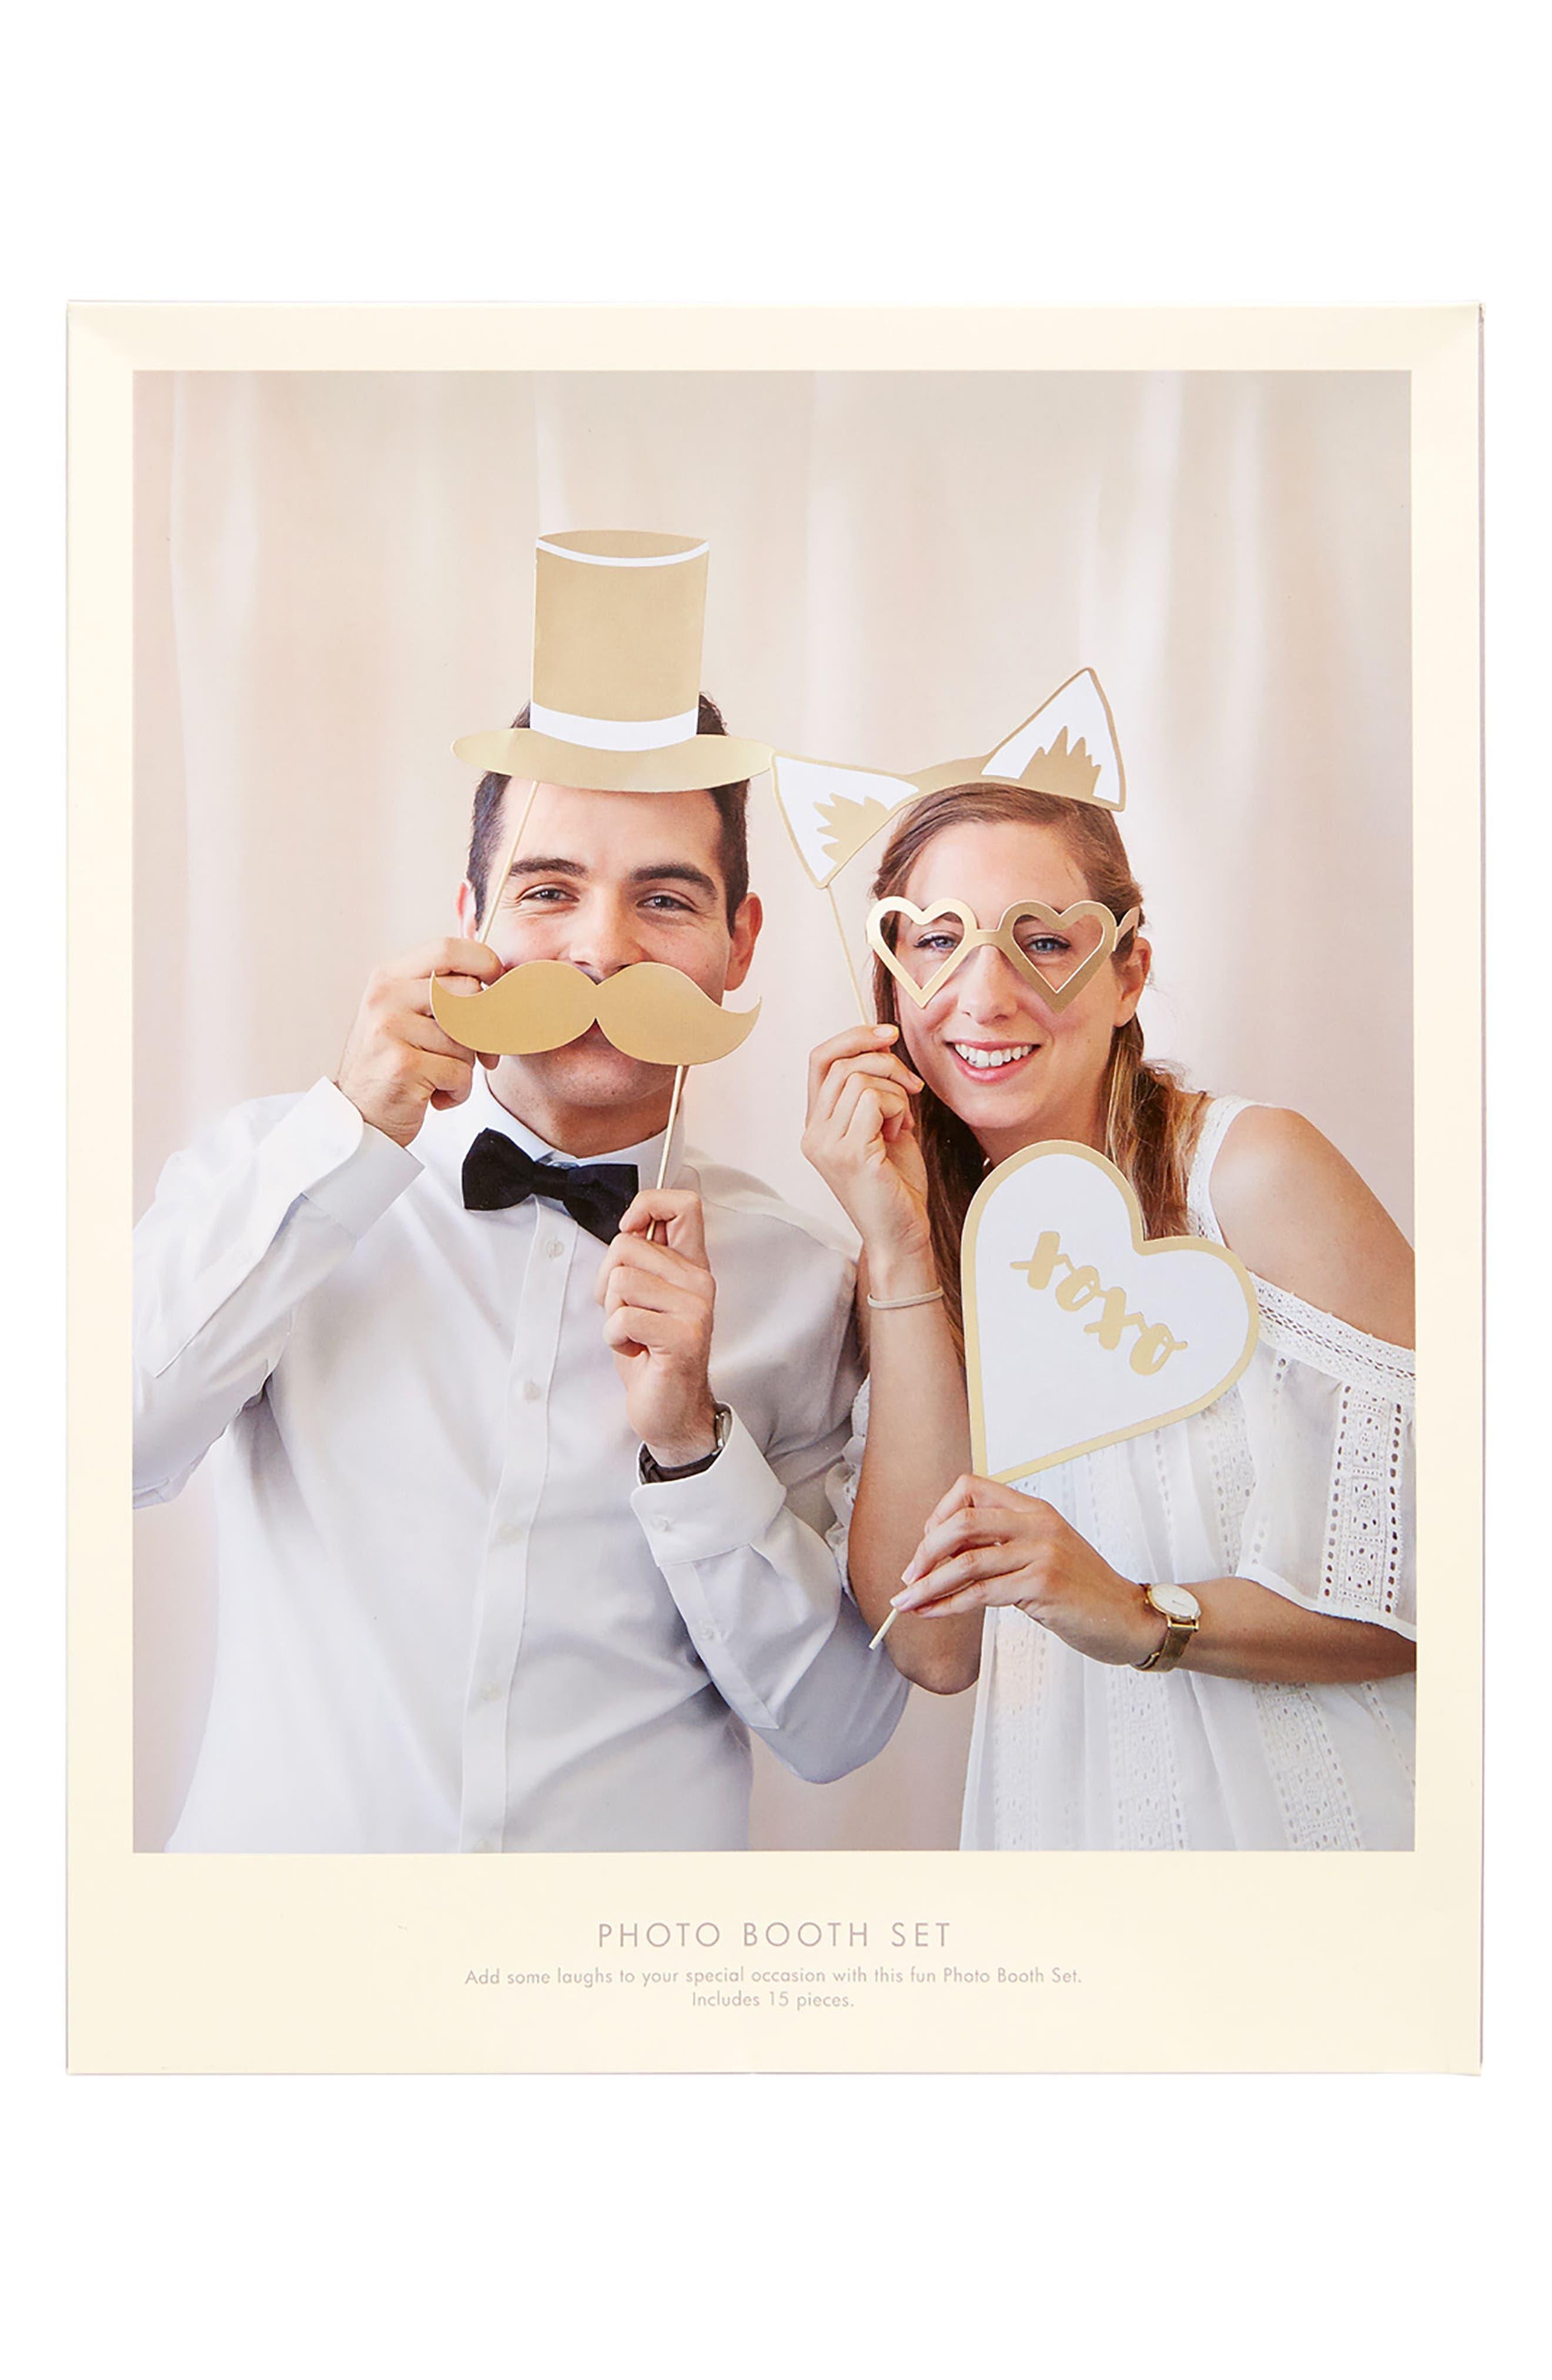 15-Piece Wedding Photo Booth Prop Set,                             Alternate thumbnail 2, color,                             101